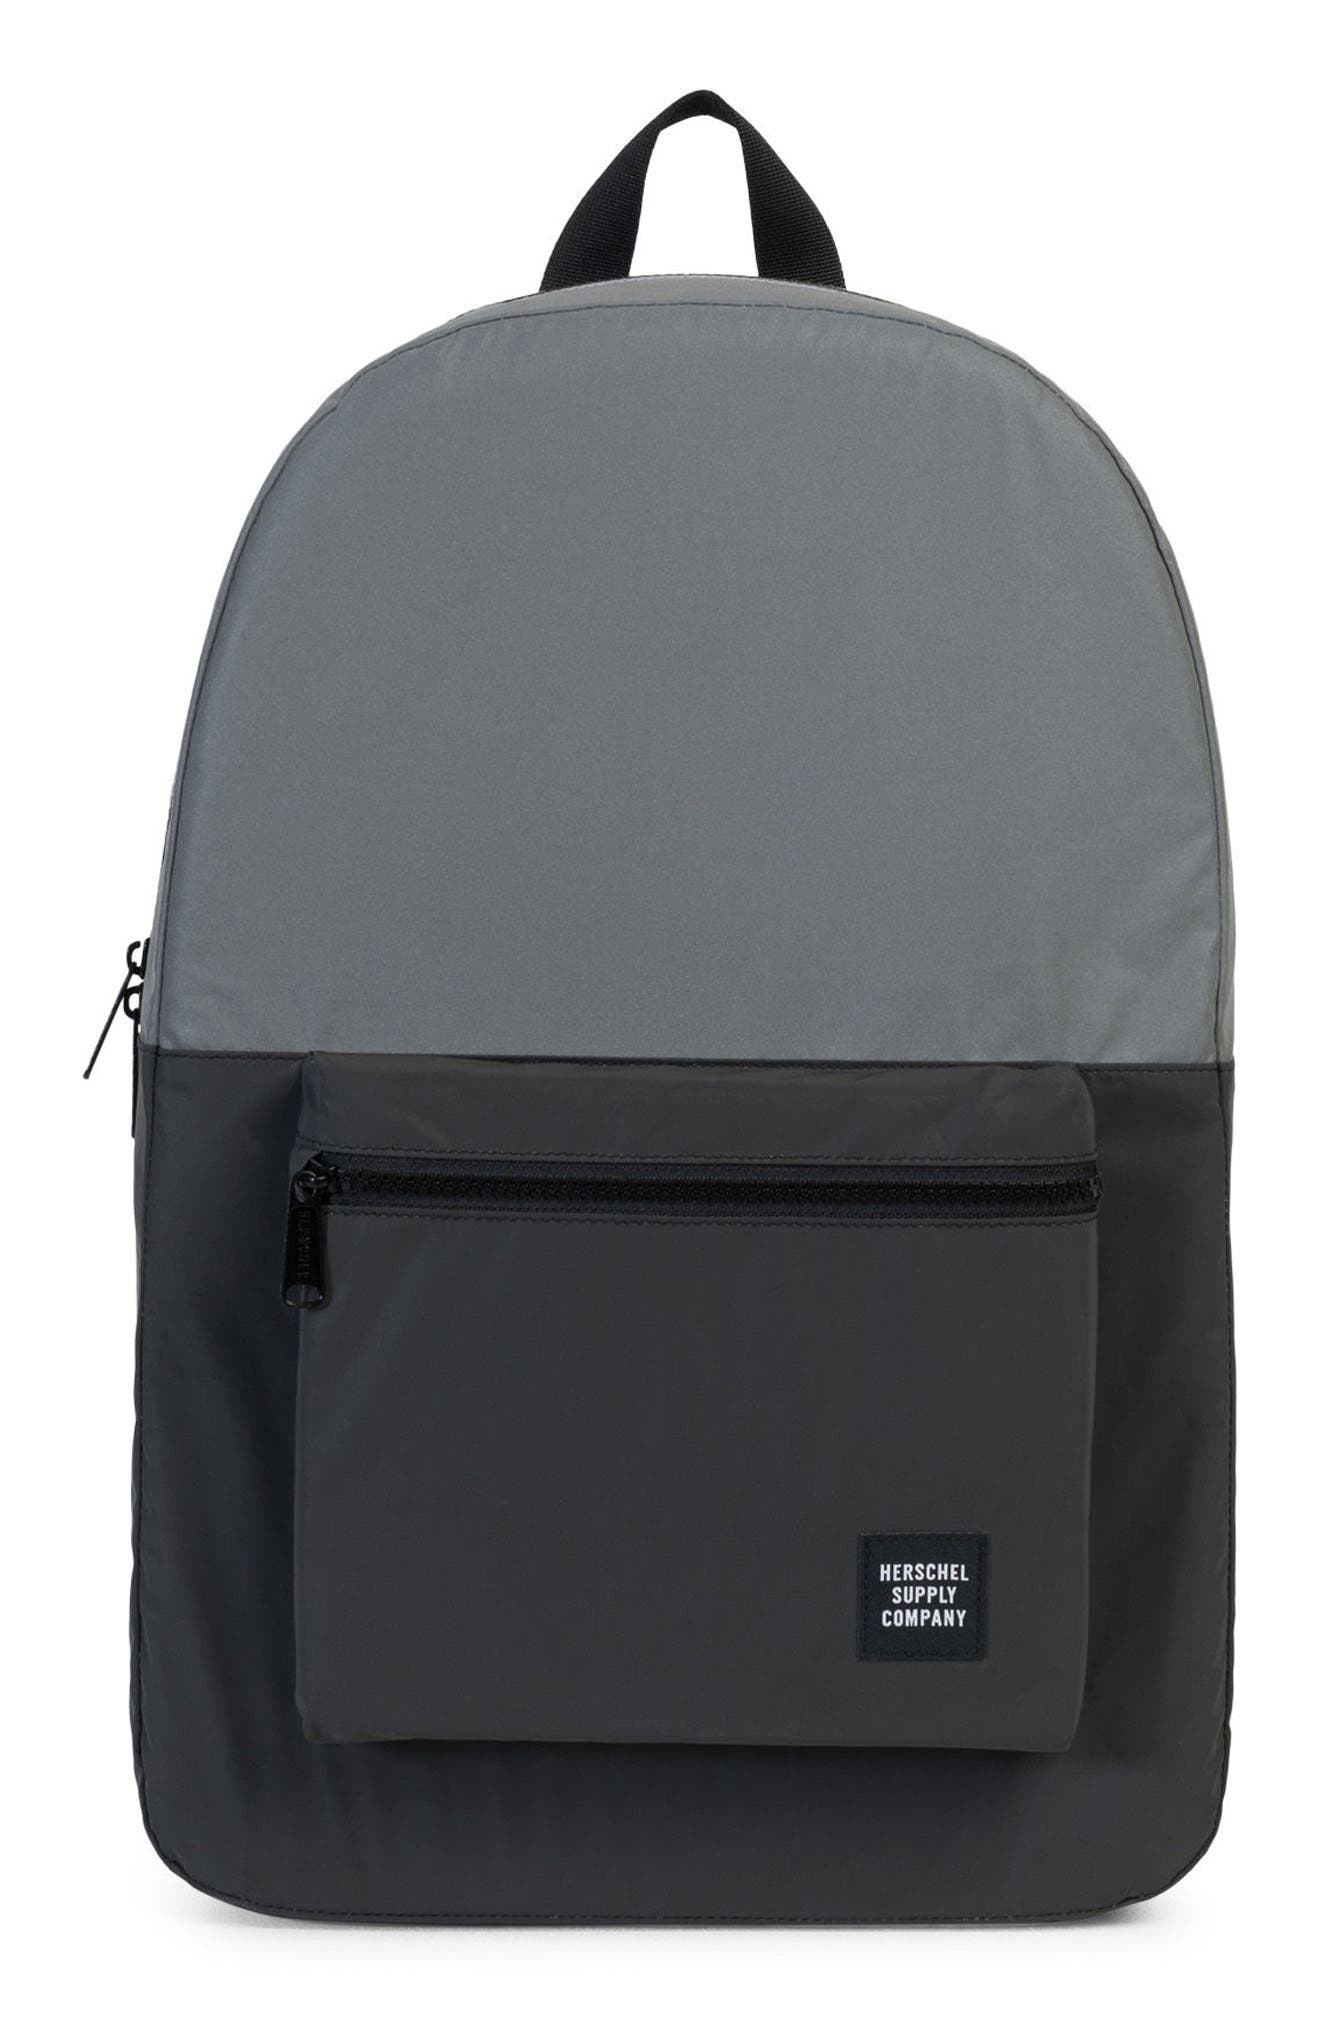 Alternate Image 1 Selected - Herschel Supply Co. Heritage Reflective Backpack